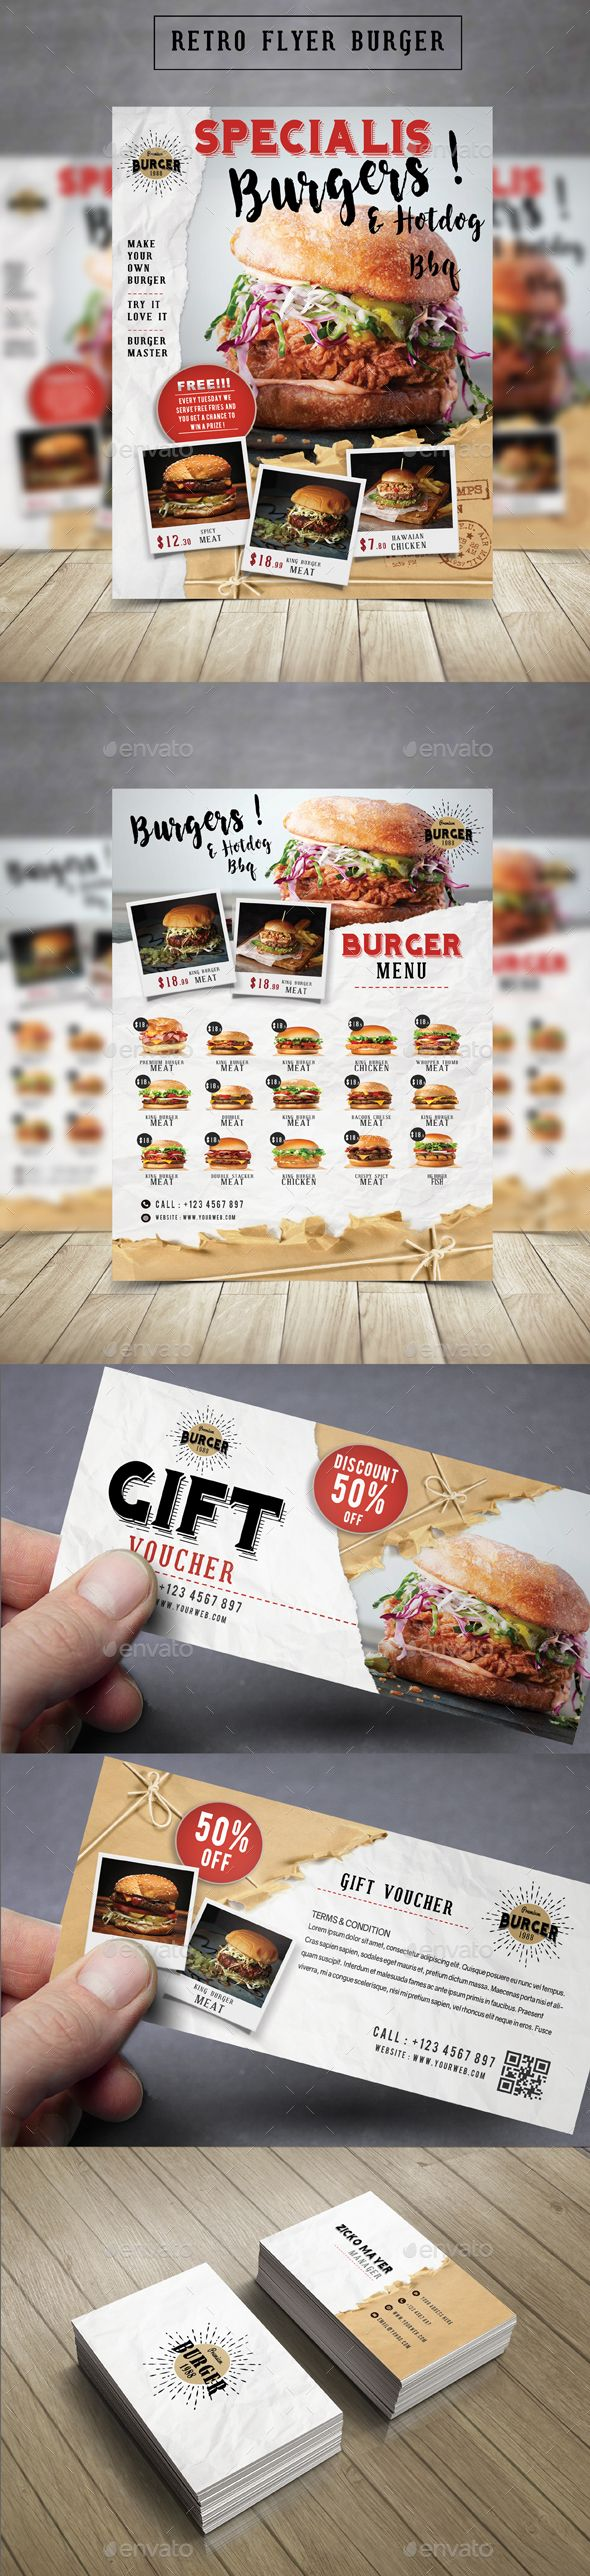 Retro Flyer Burger  — PSD Template #retro menu #flyer • Download ➝ https://graphicriver.net/item/retro-flyer-burger/18297915?ref=pxcr